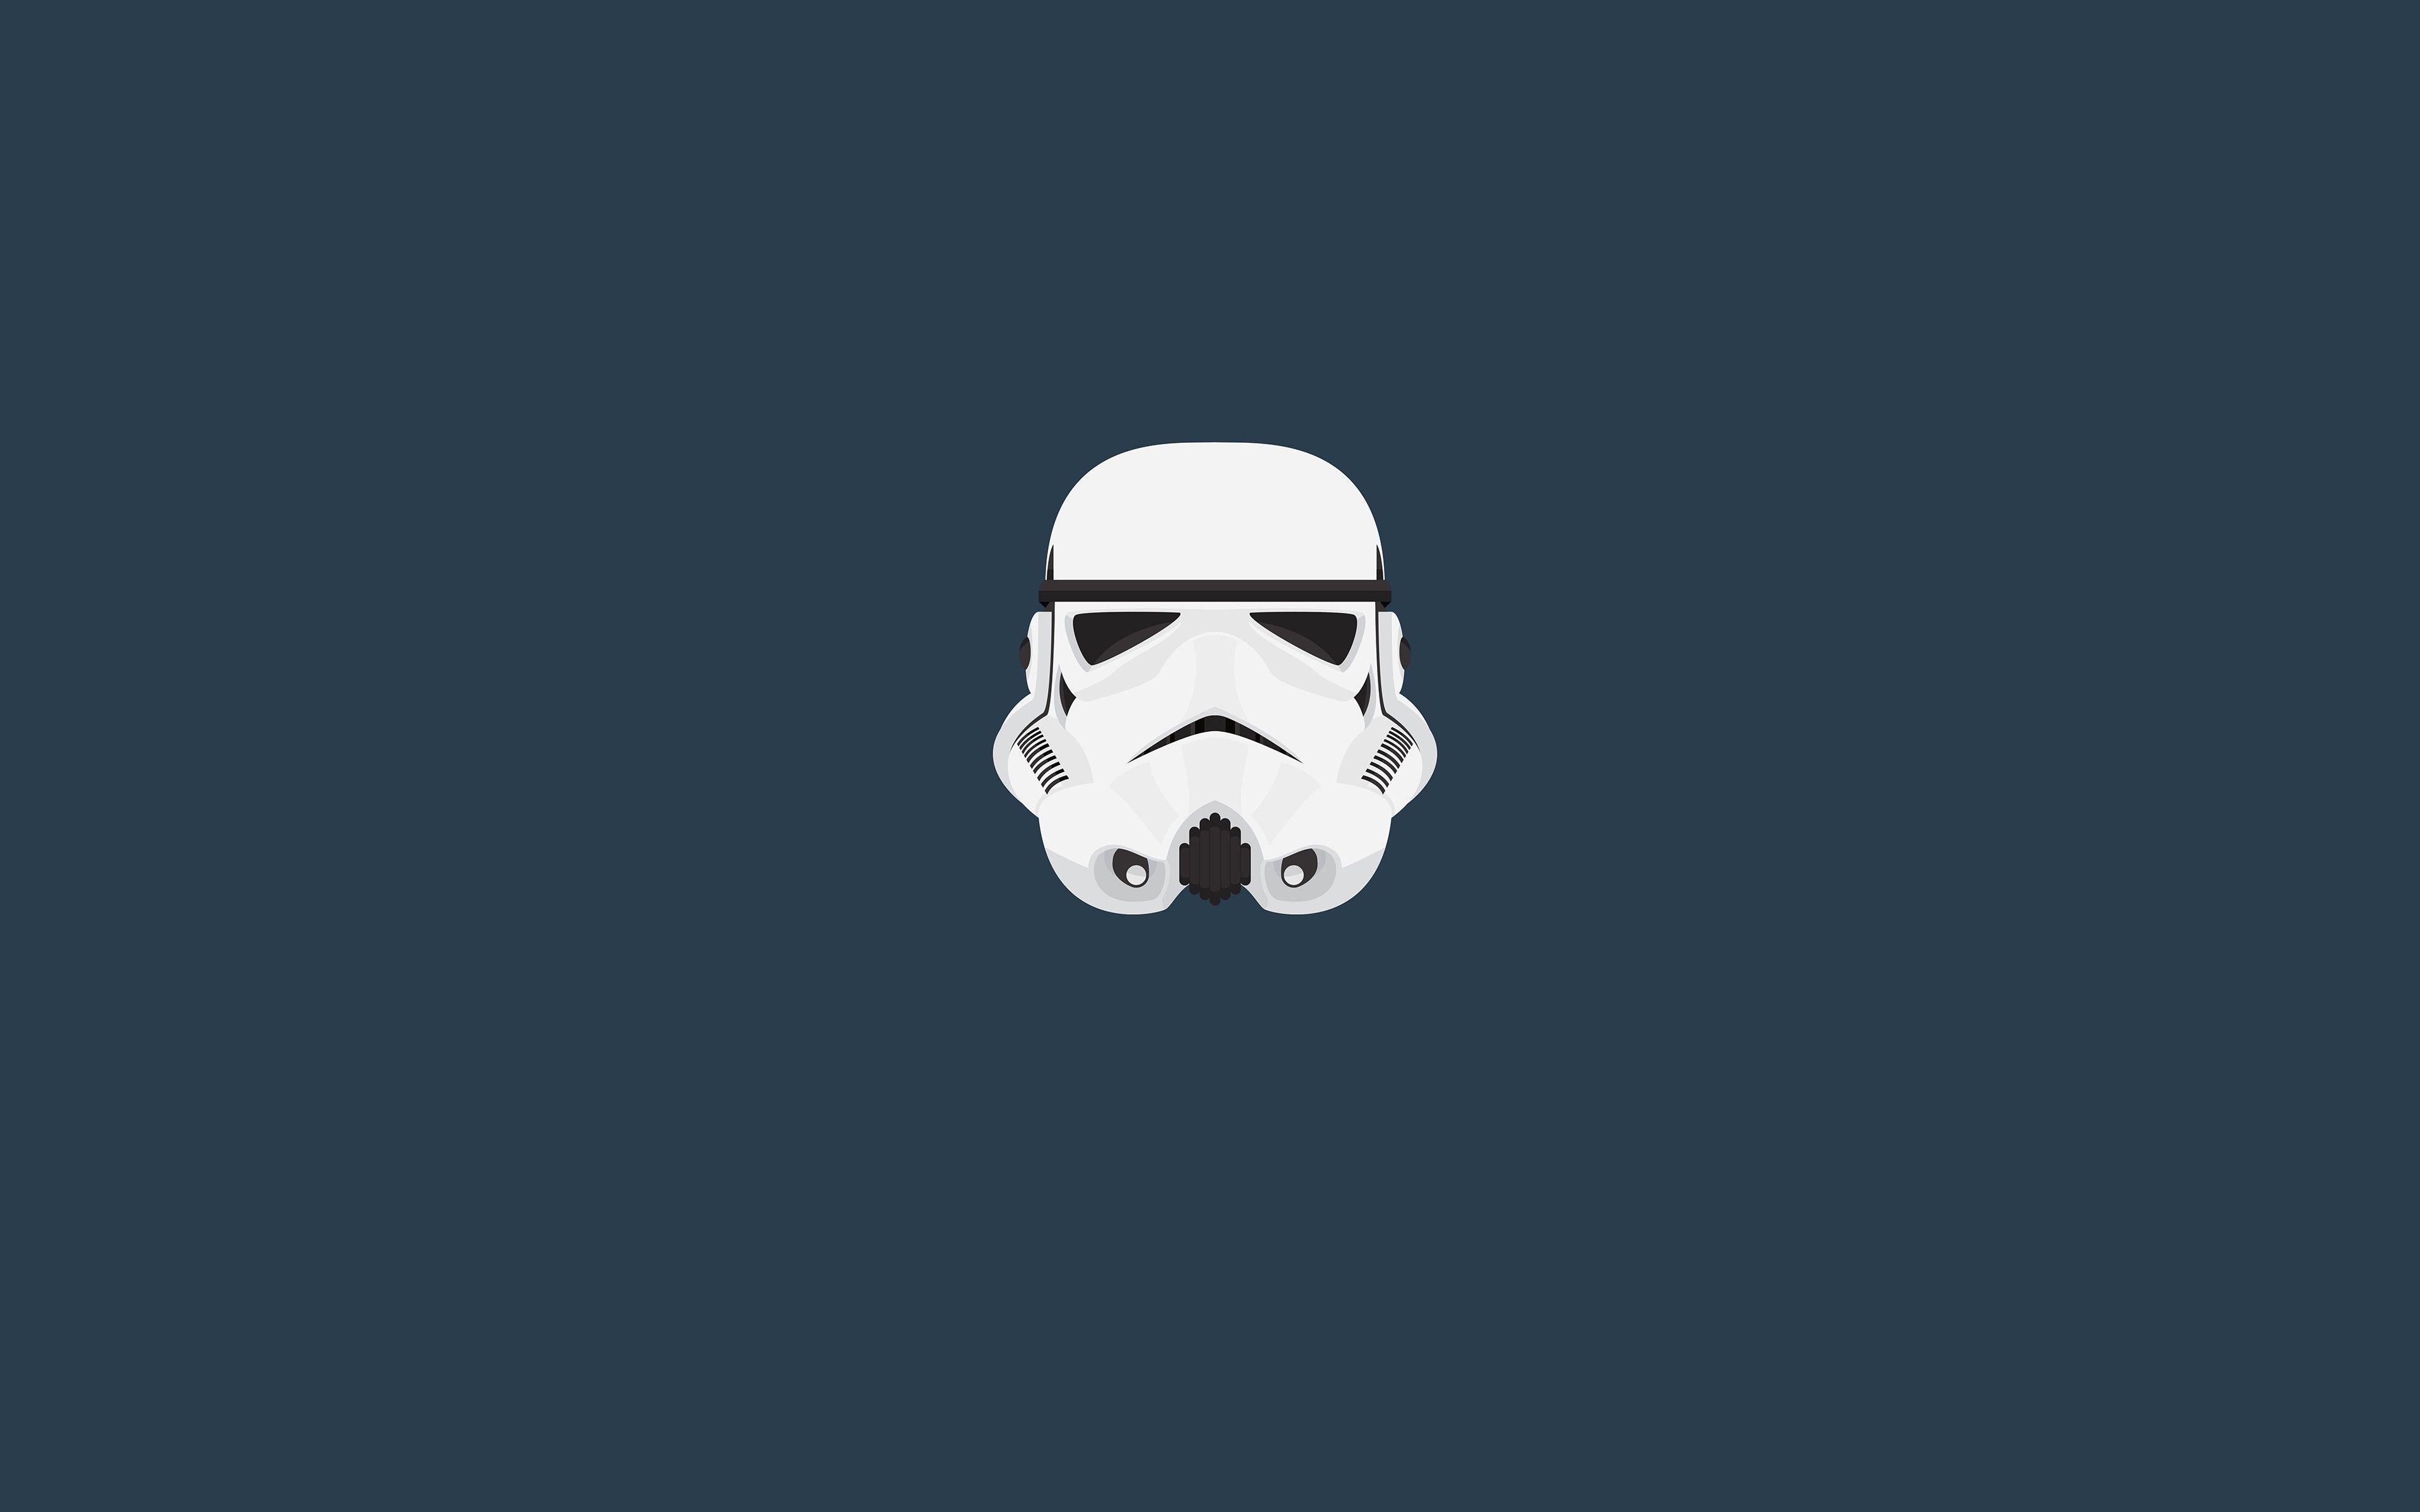 Stormtrooper Star Wars Minimalism Helmet Wallpaper Minimalist Wallpaper Hd Wallpaper Star Wars